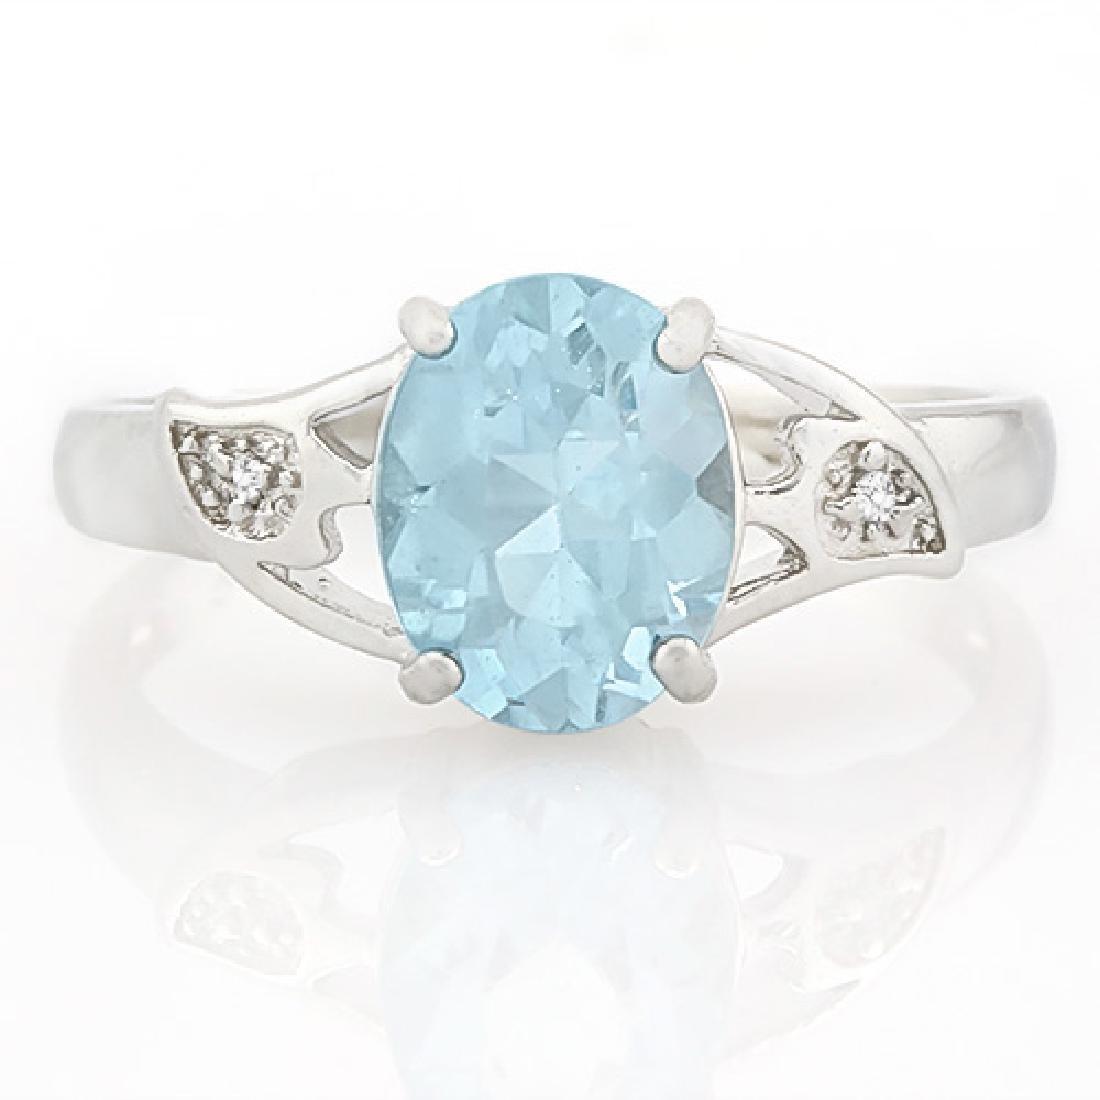 2 CARAT BABY SWISS BLUE TOPAZ & DIAMOND 925 STERLING SI